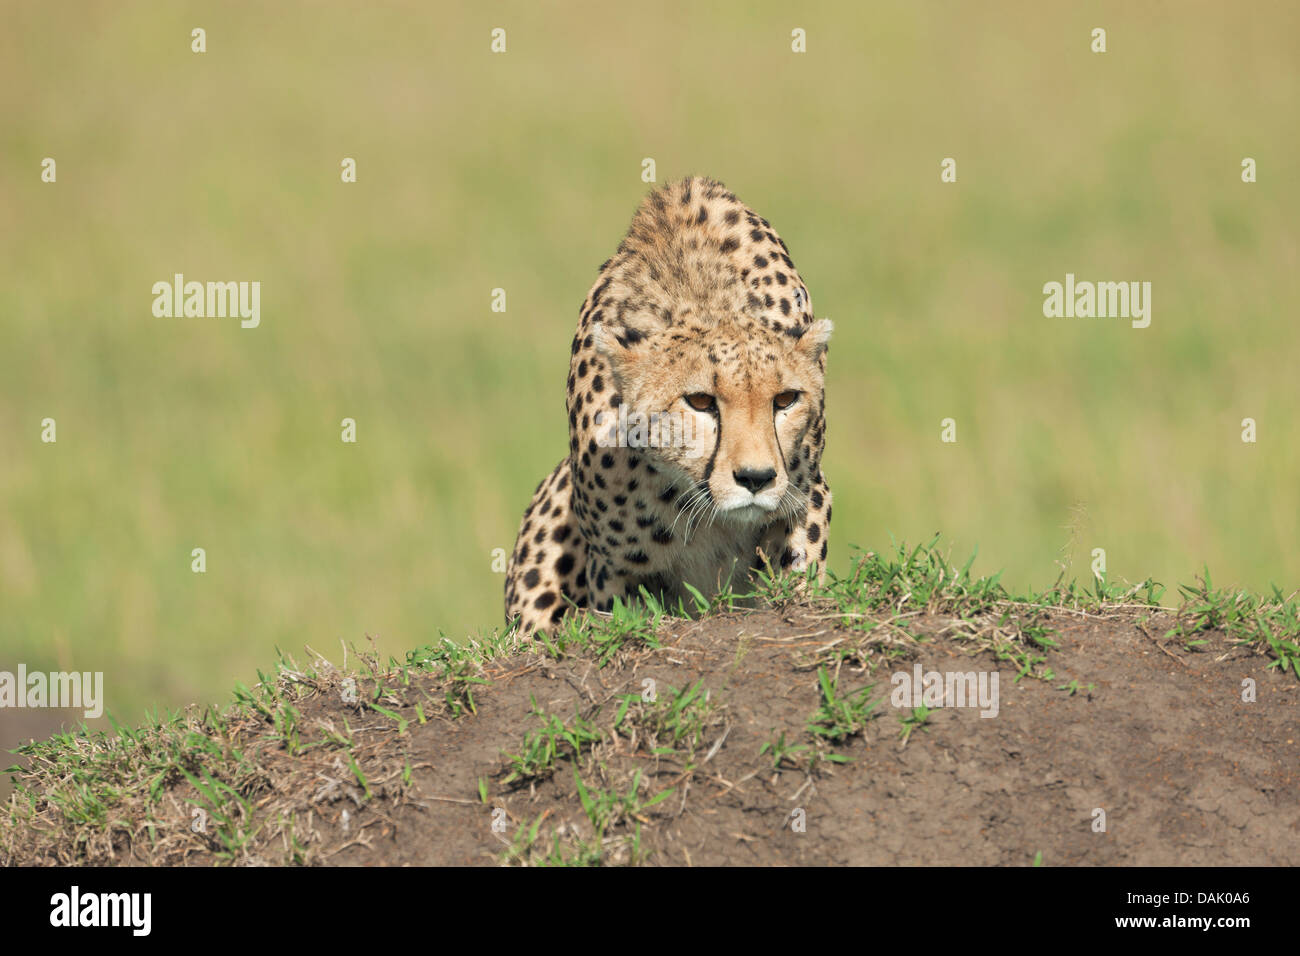 Cheetah (Acinonyx jubatus) observing potential prey - Stock Image